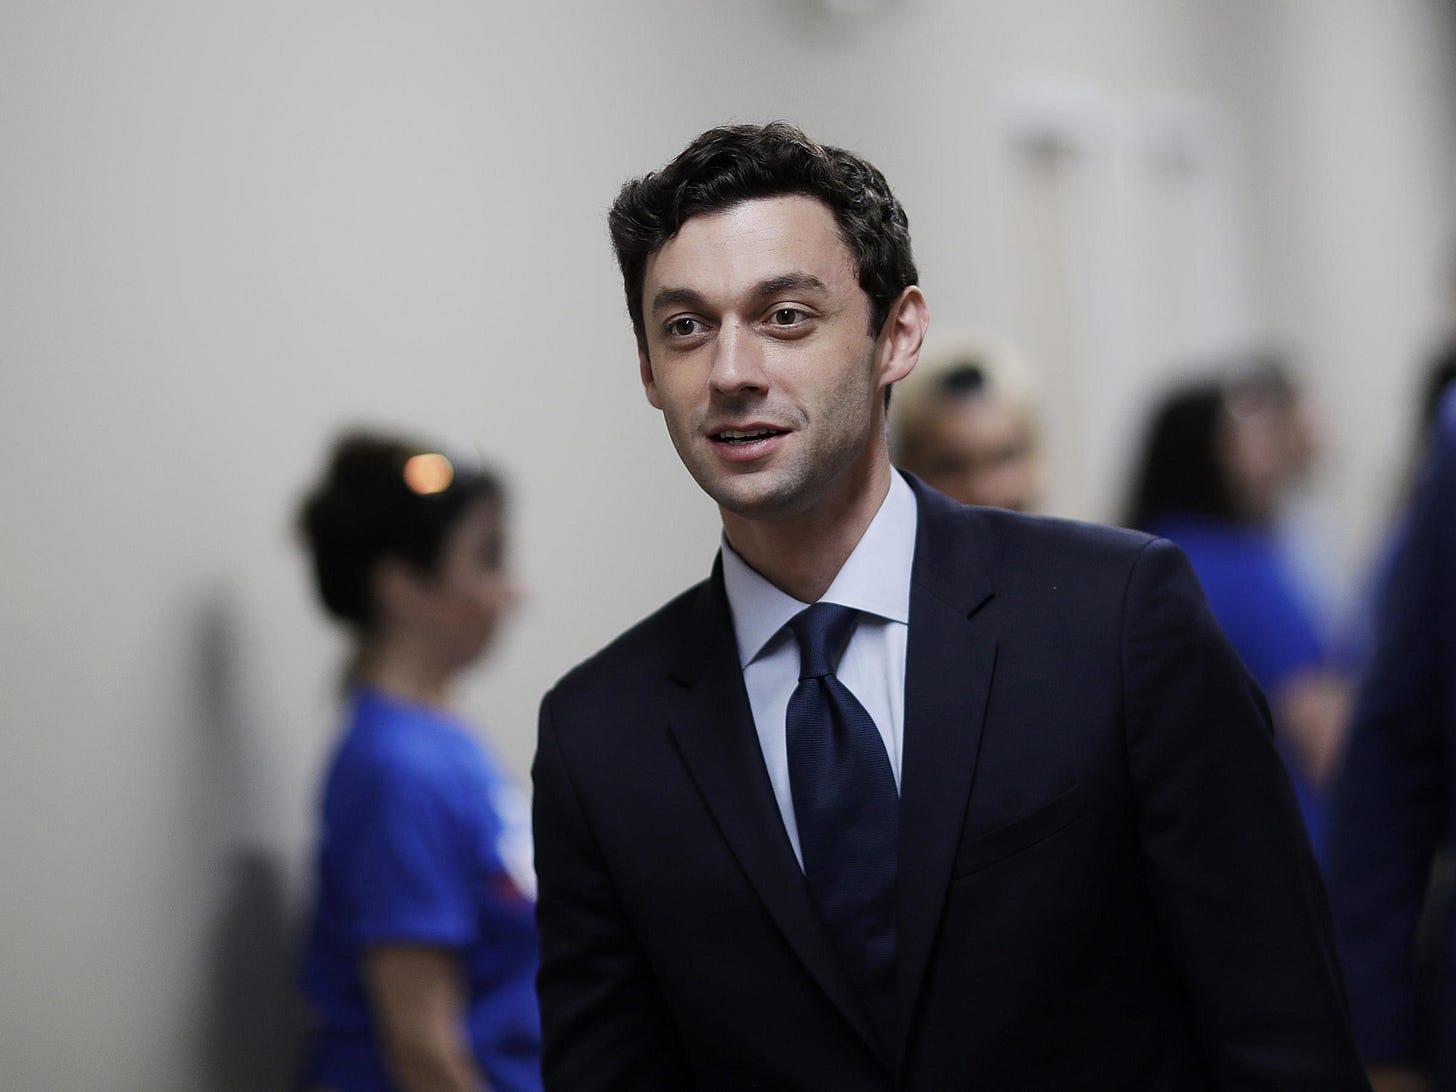 Jon Ossoff Wins Georgia's Democratic Senate Primary | NPR Illinois